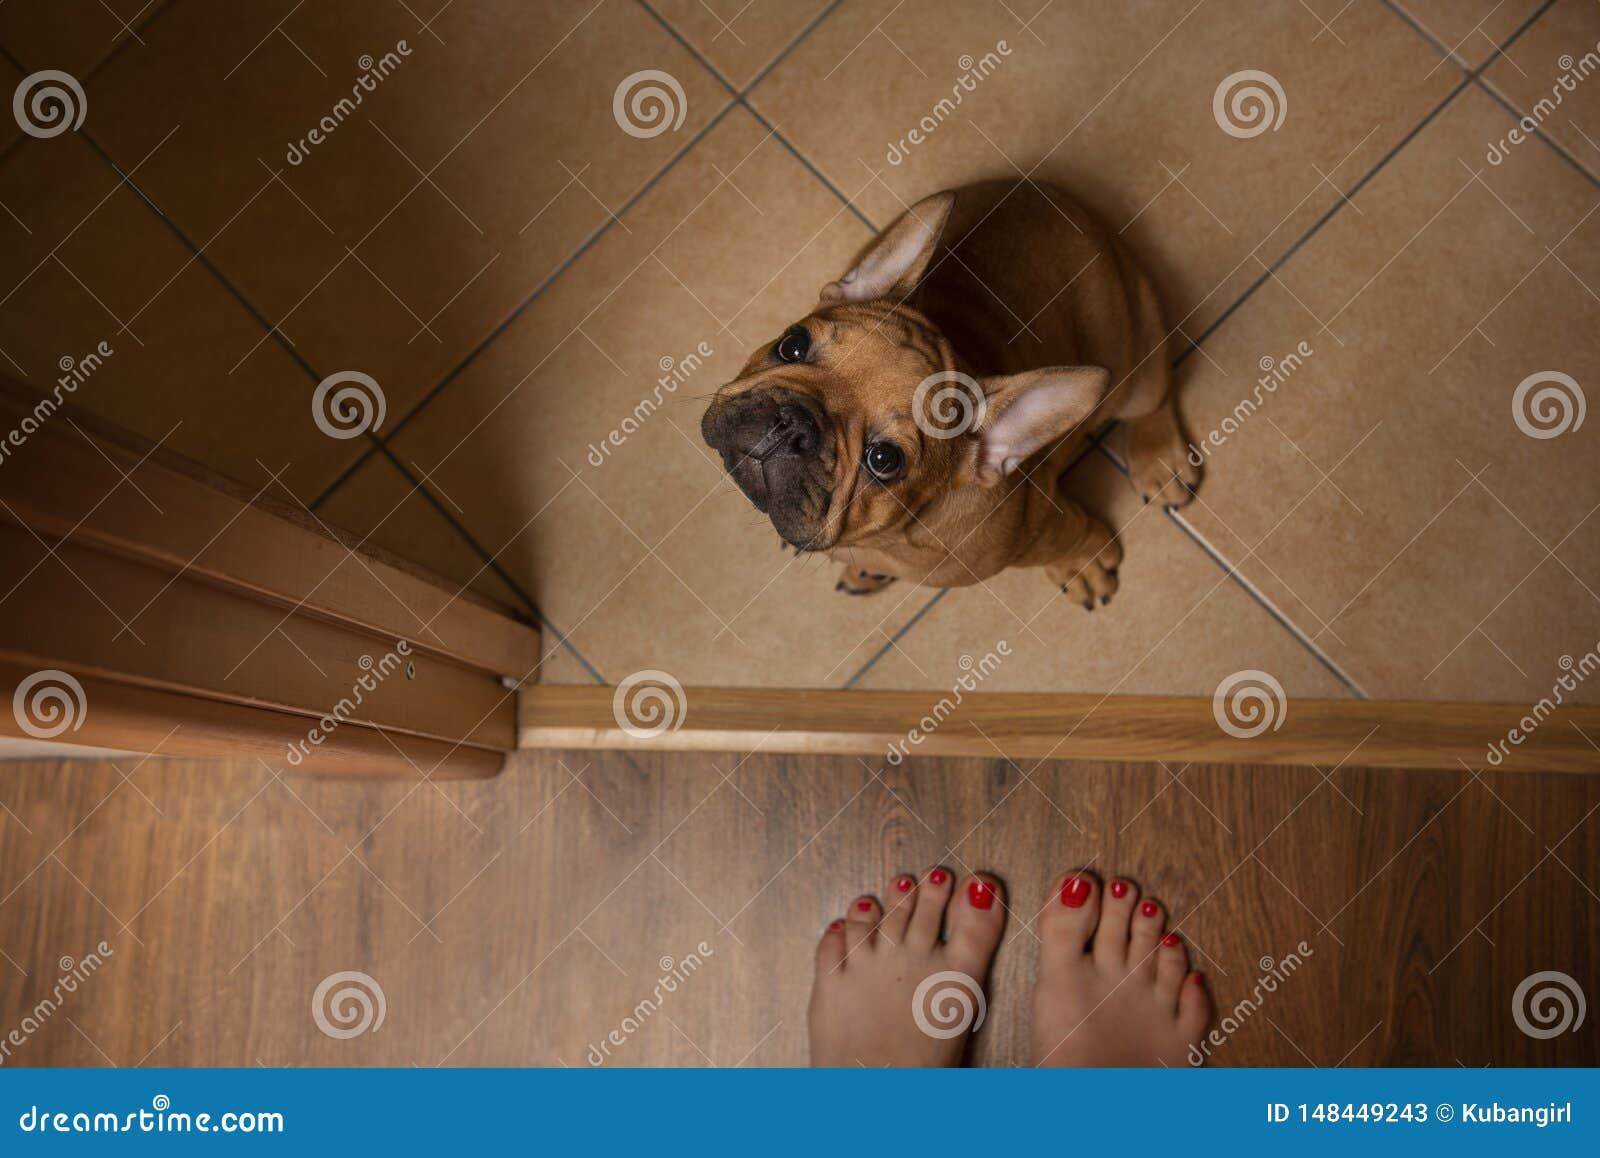 Lost little puppy on the doorstep